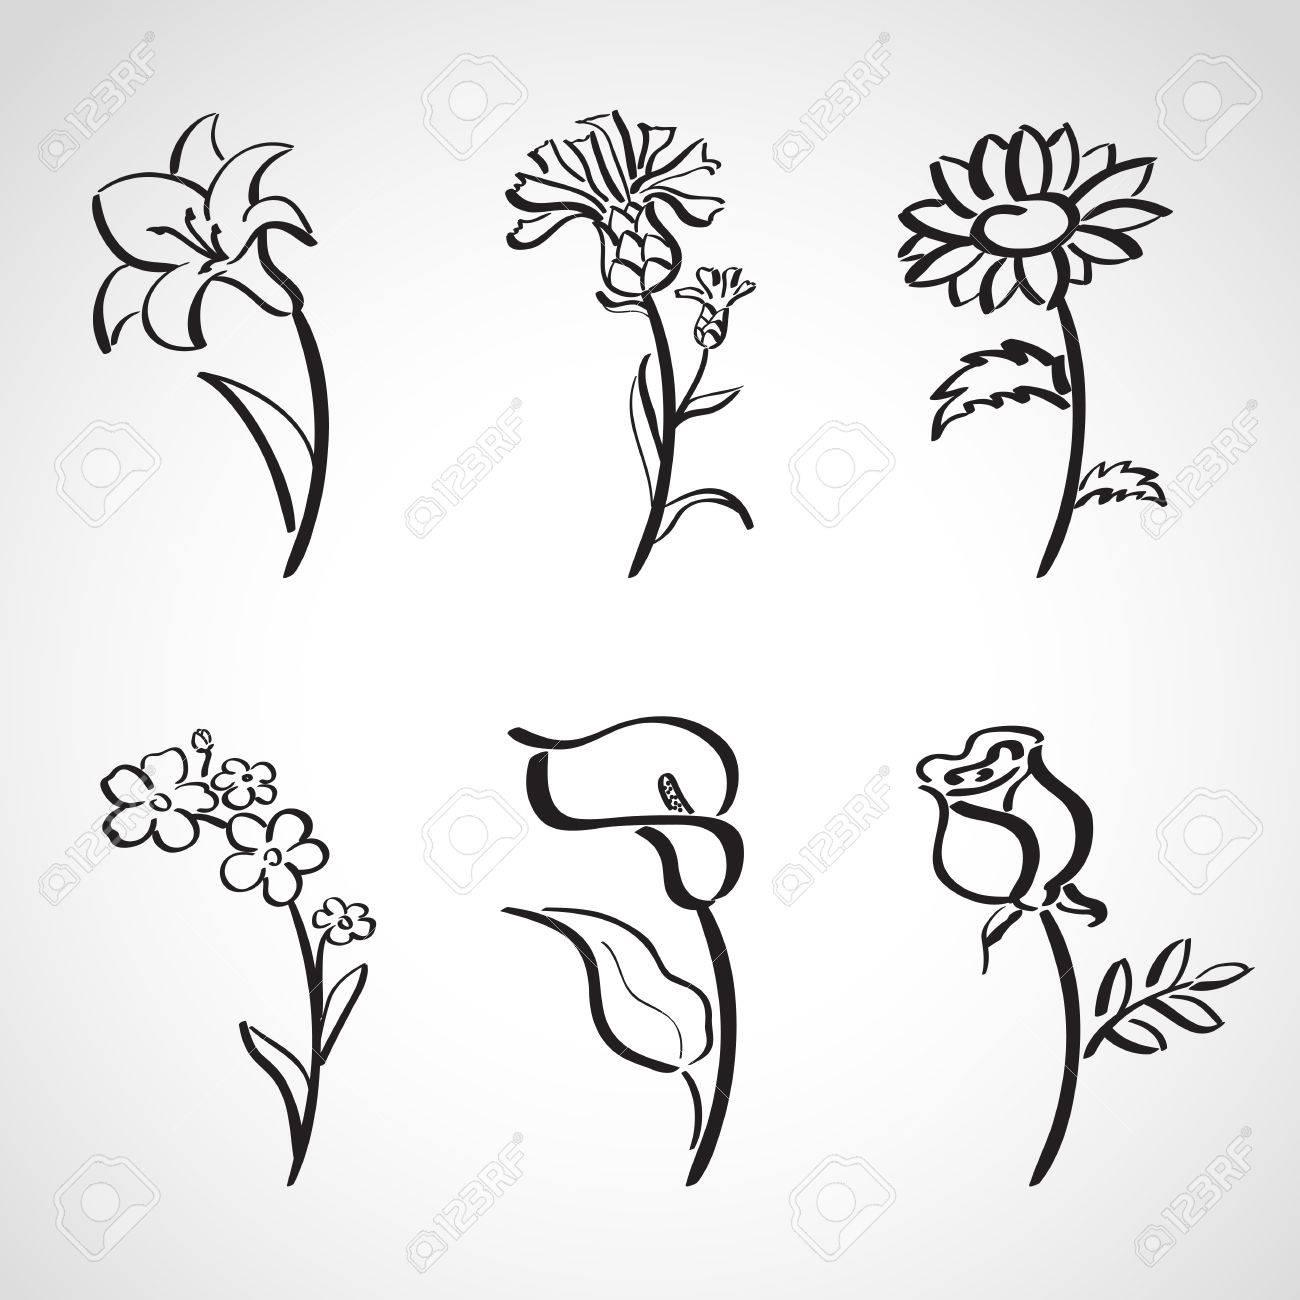 Ink style hand drawn sketch set - summer flowers - 23869043